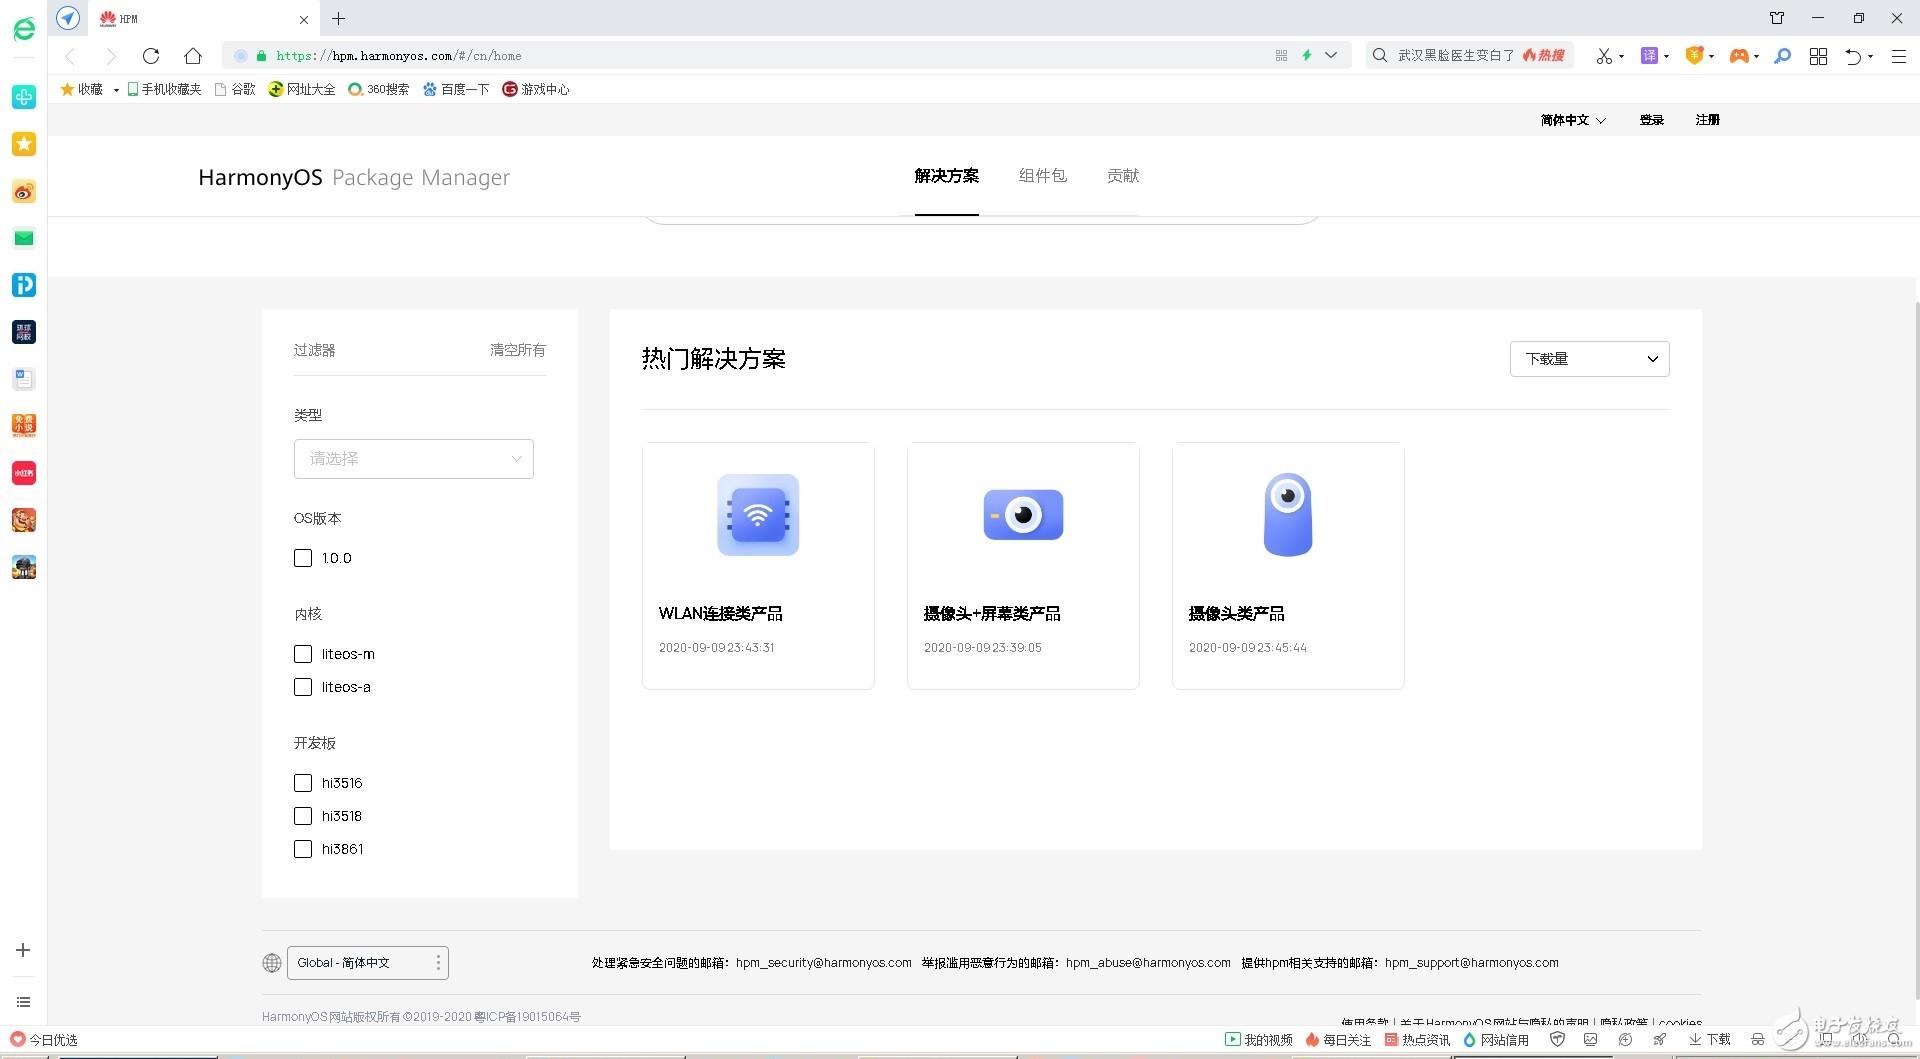 【HarmonyOS HiSpark Wi-Fi IoT 套件试用连载】学习经验-下载源码并尝试开始编程